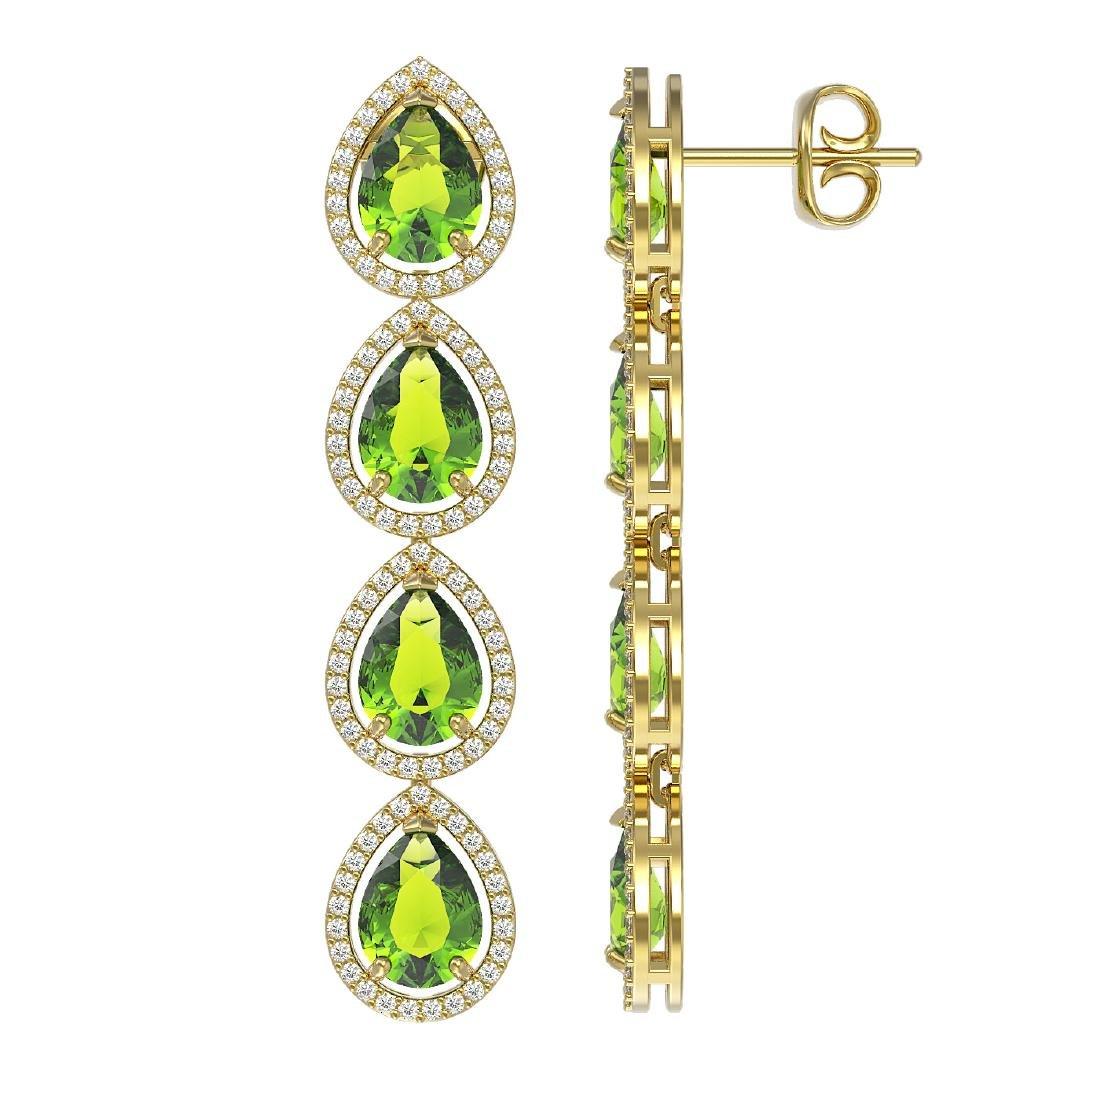 8.4 CTW Peridot & Diamond Halo Earrings 10K Yellow Gold - 2